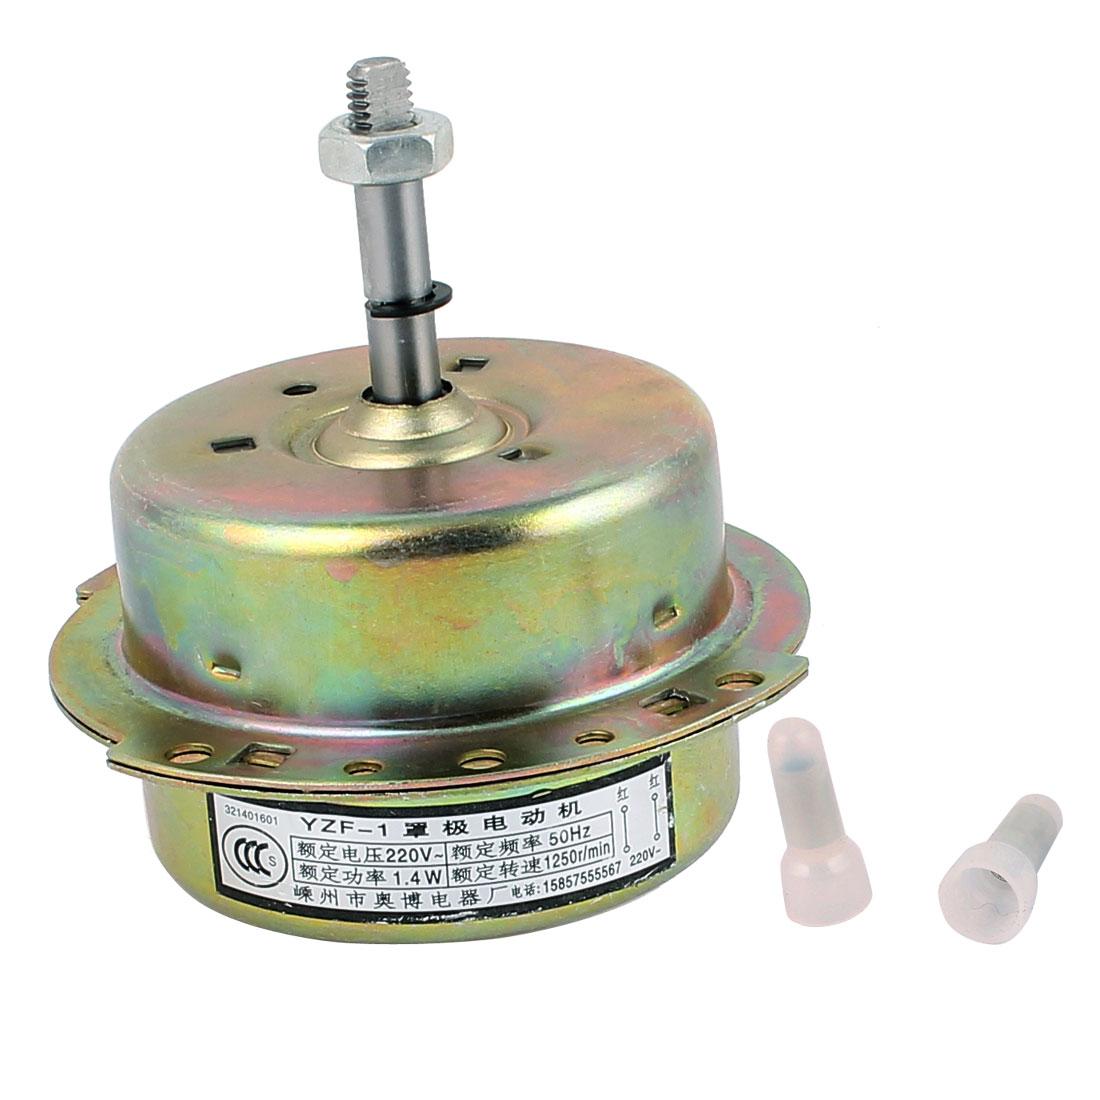 AC 220V 1.4W 1250RPM 8mmx40mm Shaft Dual Bearing Ball CC Electric Ventilator Fan Motor